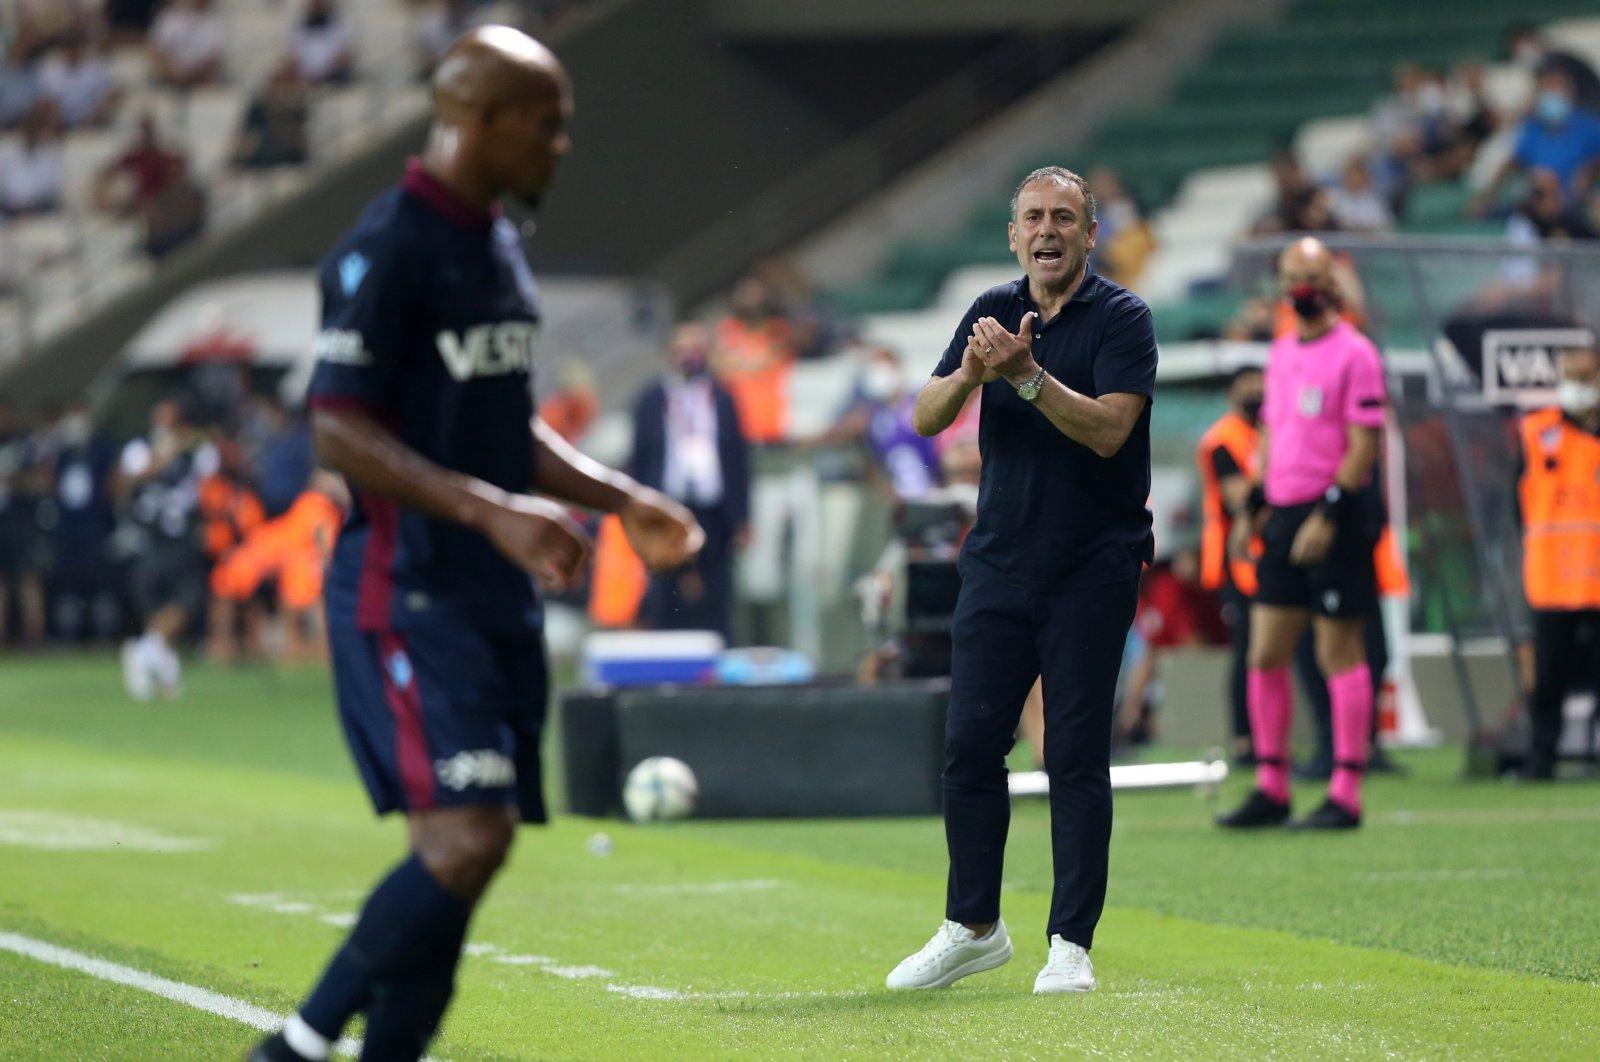 Trabzonspor coach Abdullah Avcı reacts during a Turkish Süper Lig match against Giresunspor, Giresun, northeastern Turkey, Aug. 29, 2021. (AA Photo)